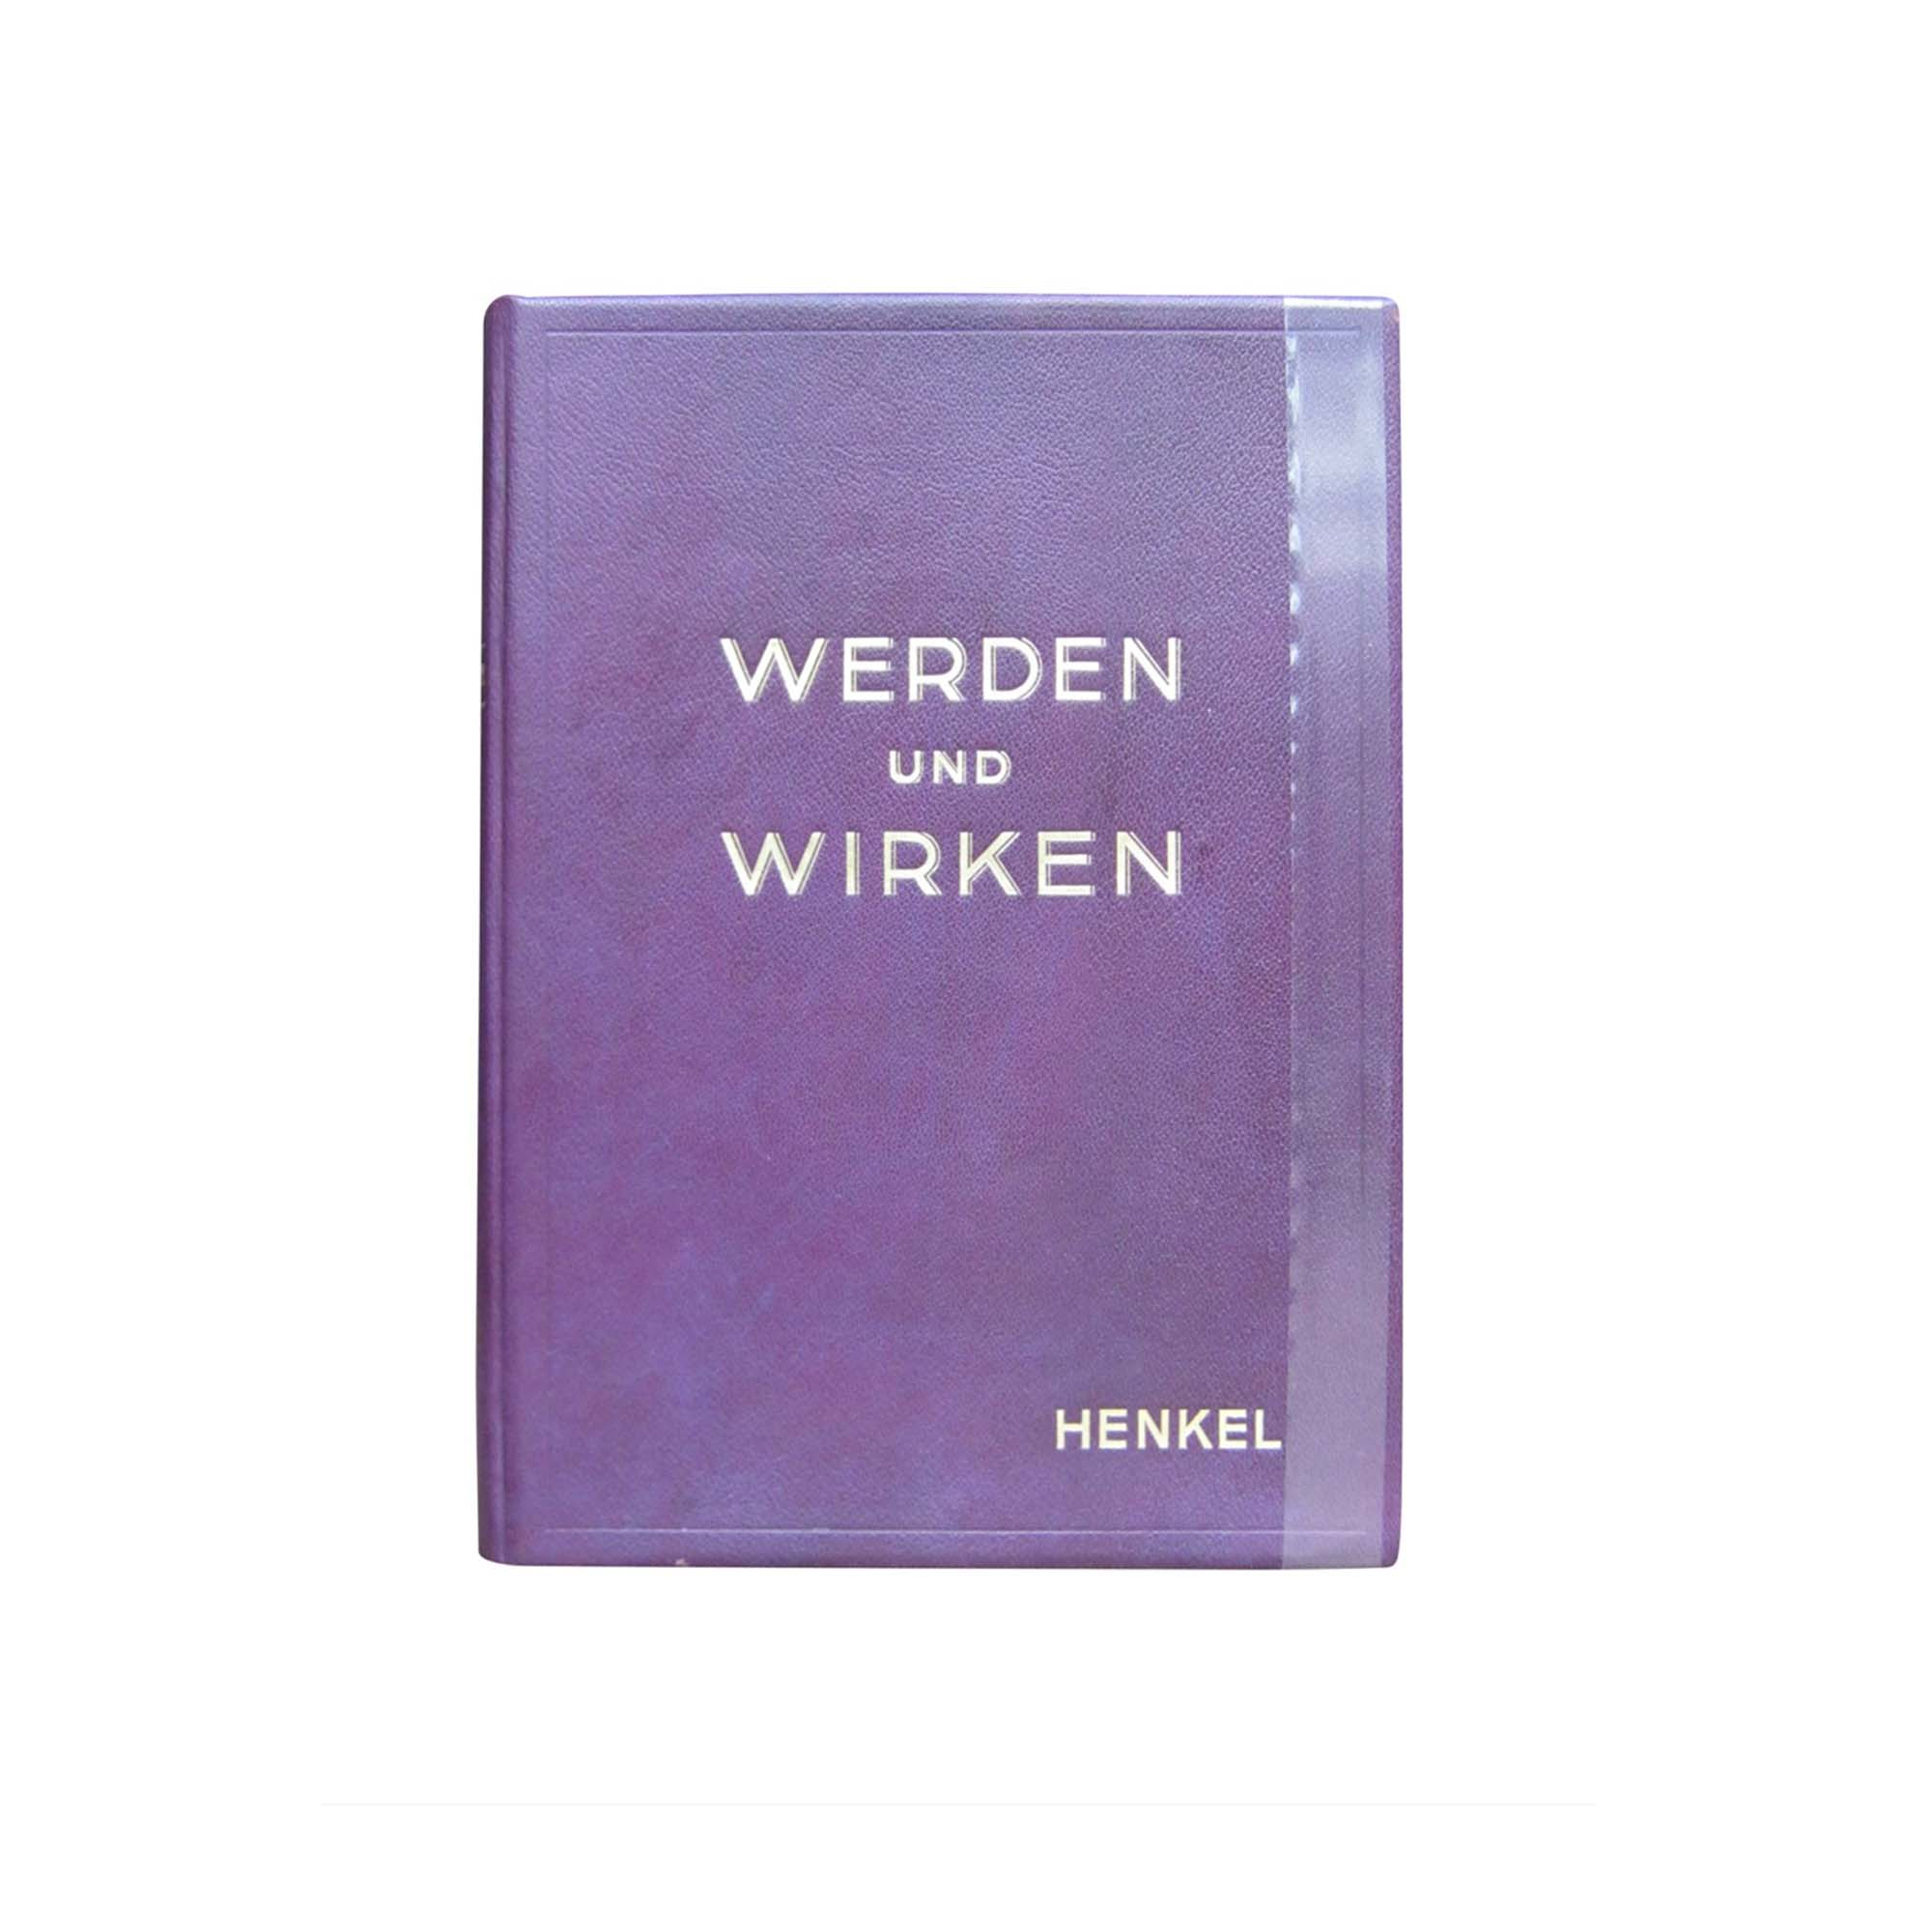 1201-Henkel-Werden-Wirken-1926-1-N.jpeg